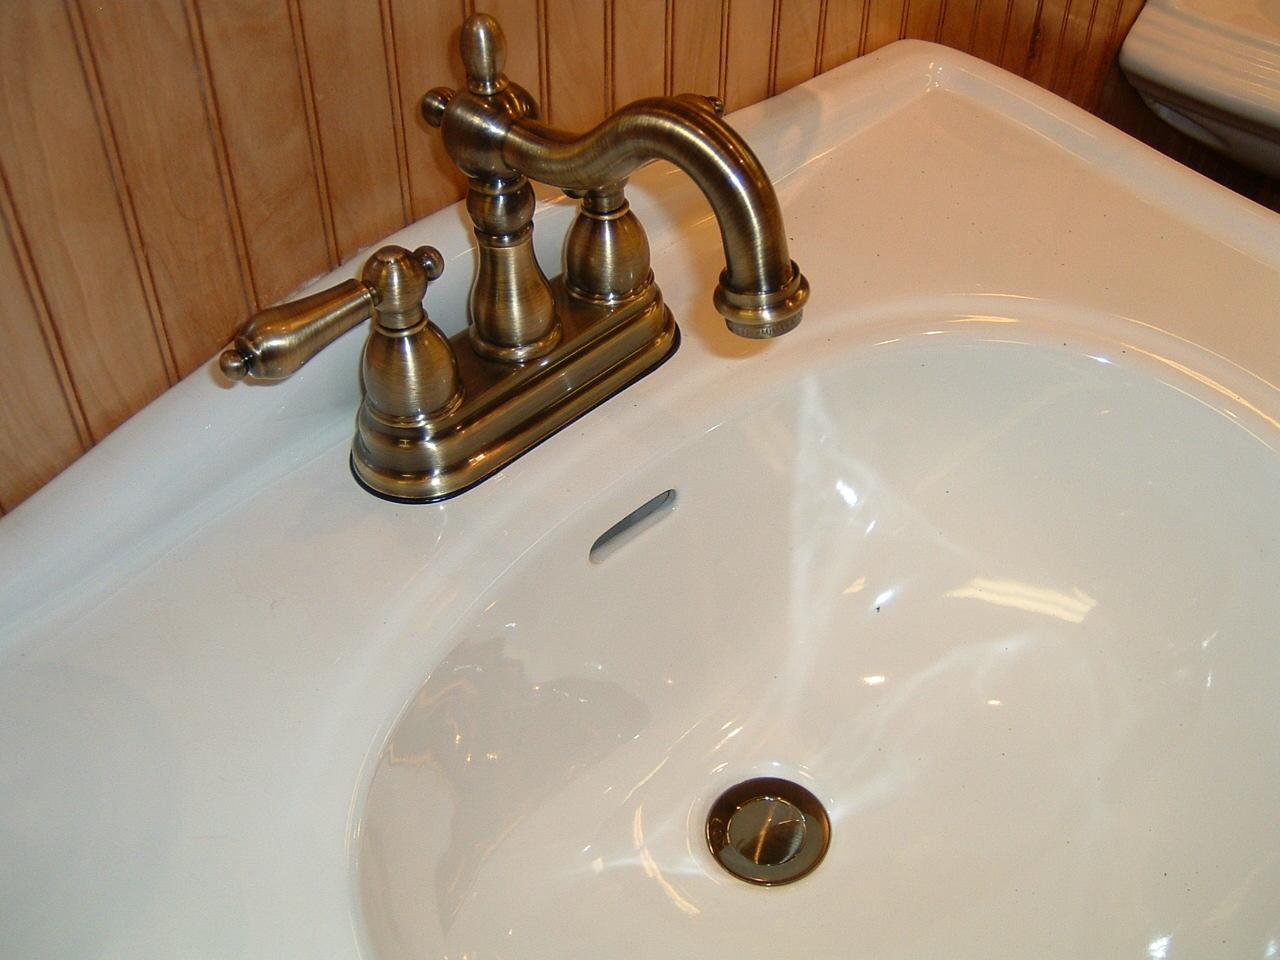 Kingston Brass Kin Kb1603al Vintage Antique Brass Faucet